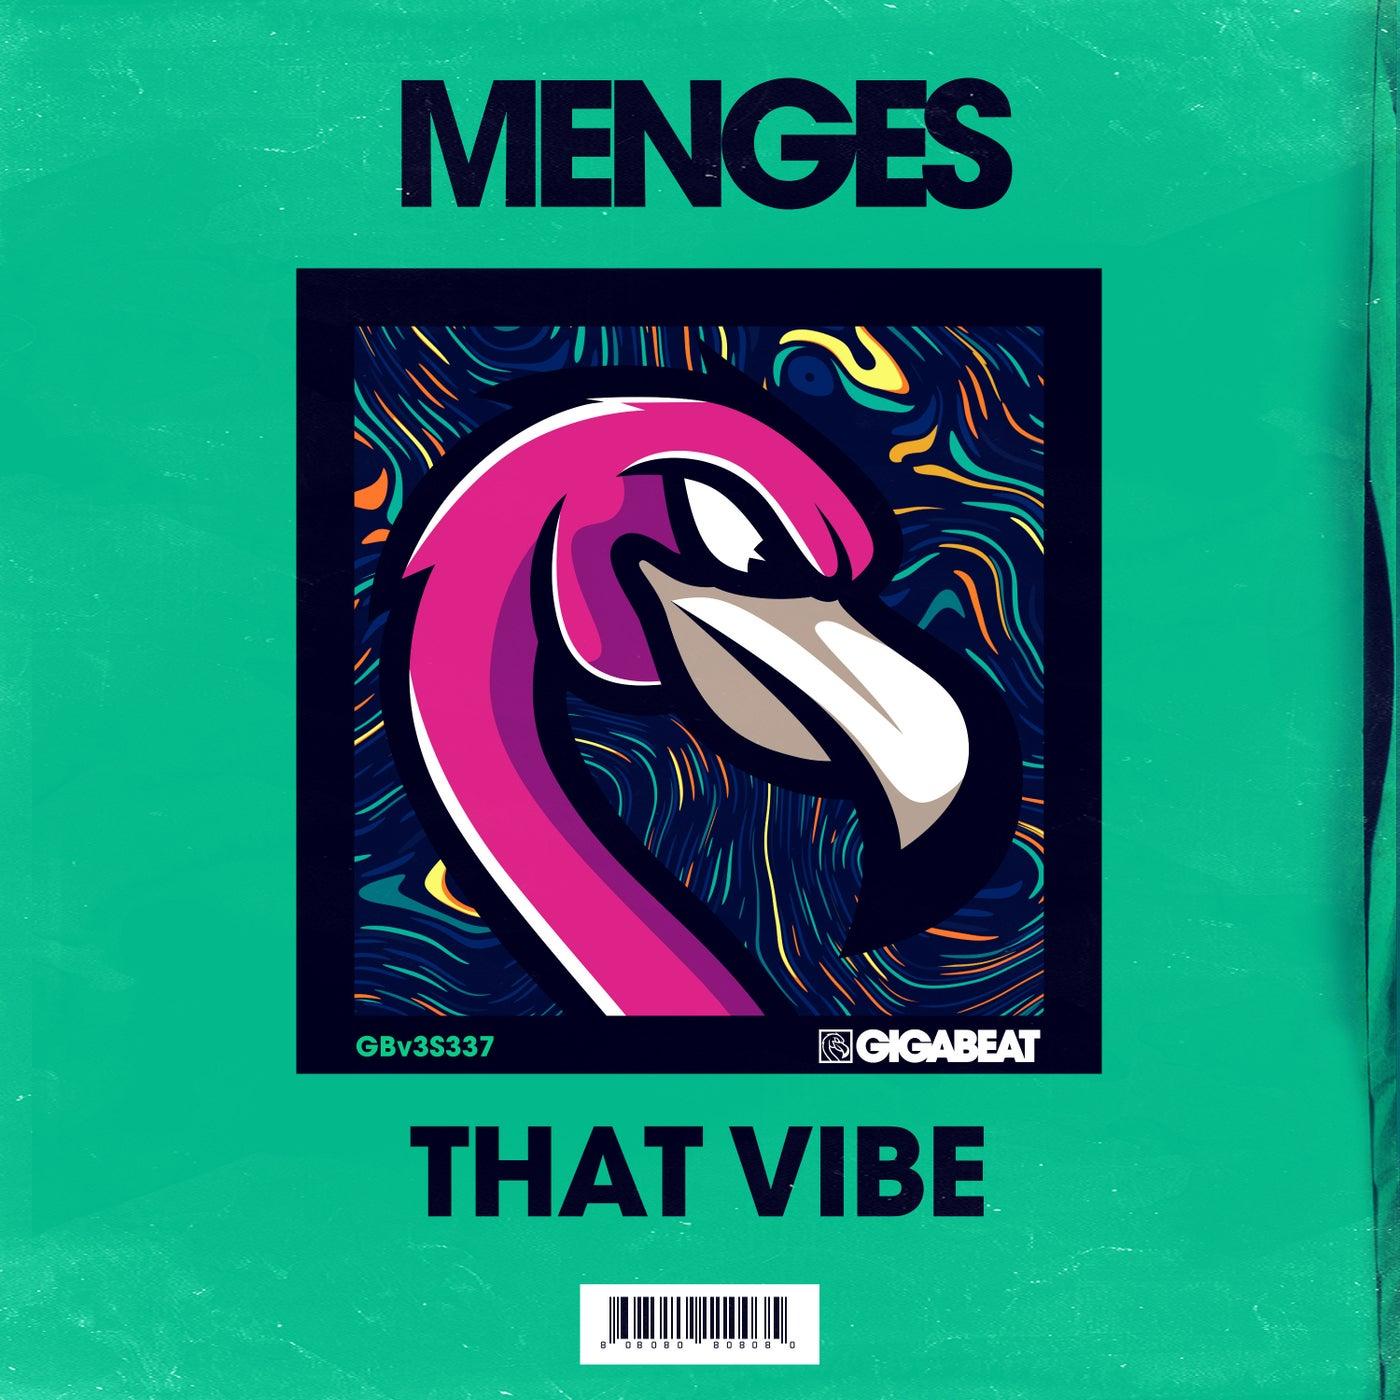 THAT VIBE (Original Mix)